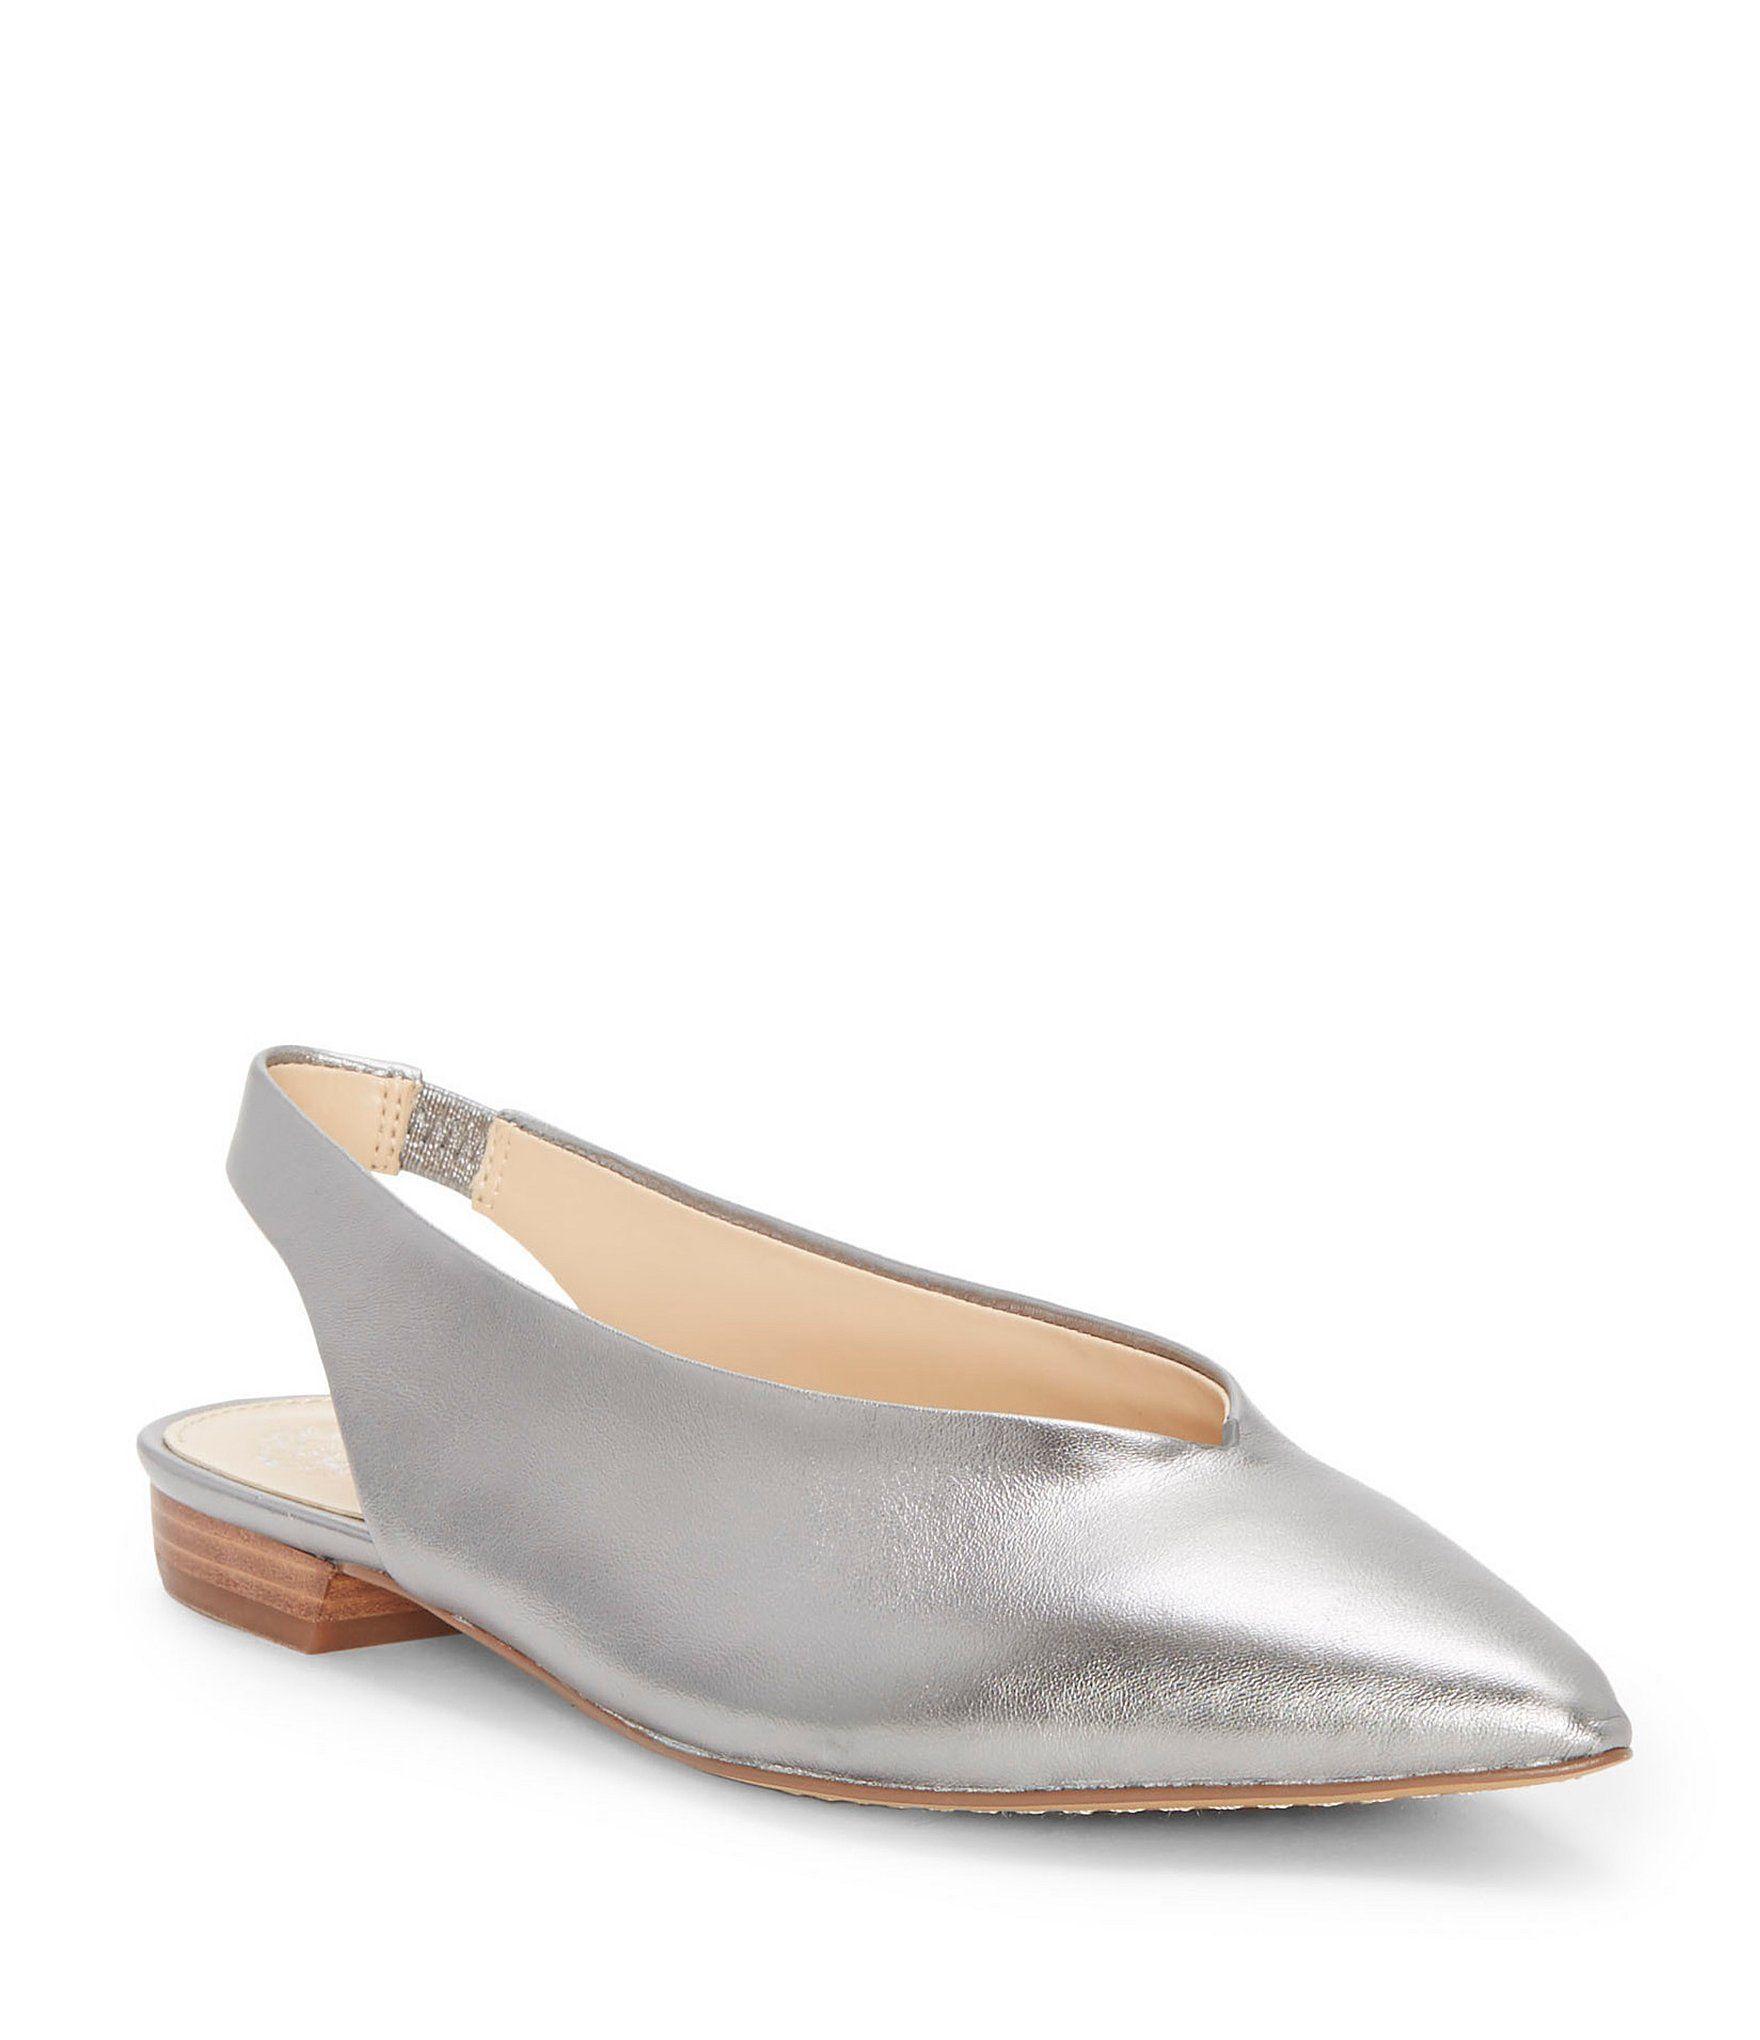 Vince Camuto Womens Maltida Ballet Flat